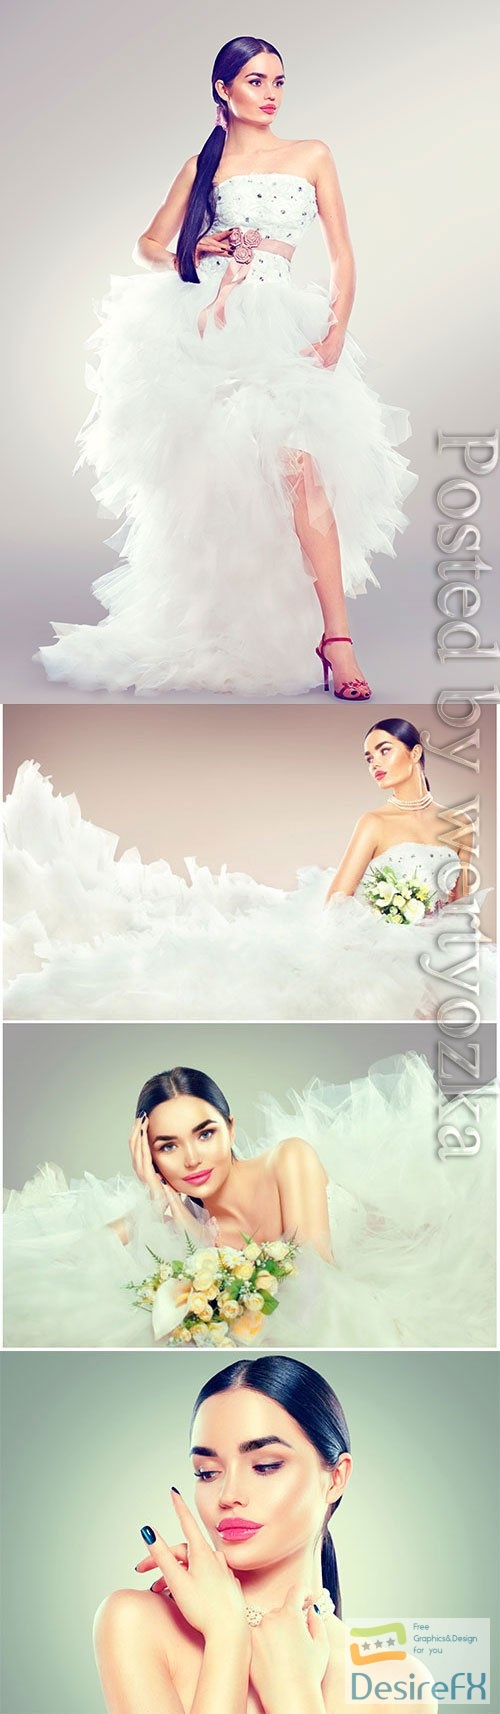 Bride in fashionable wedding dress stock photo